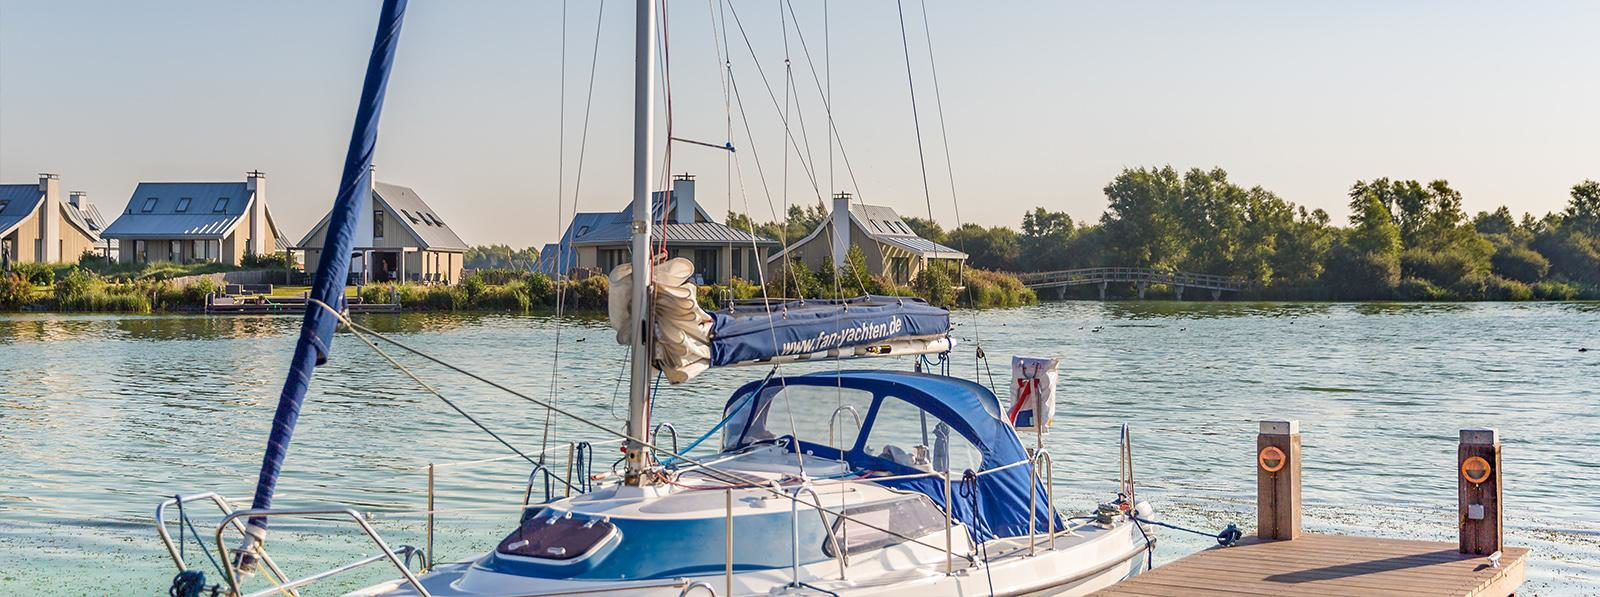 Oesterdam Marina Jachthaven